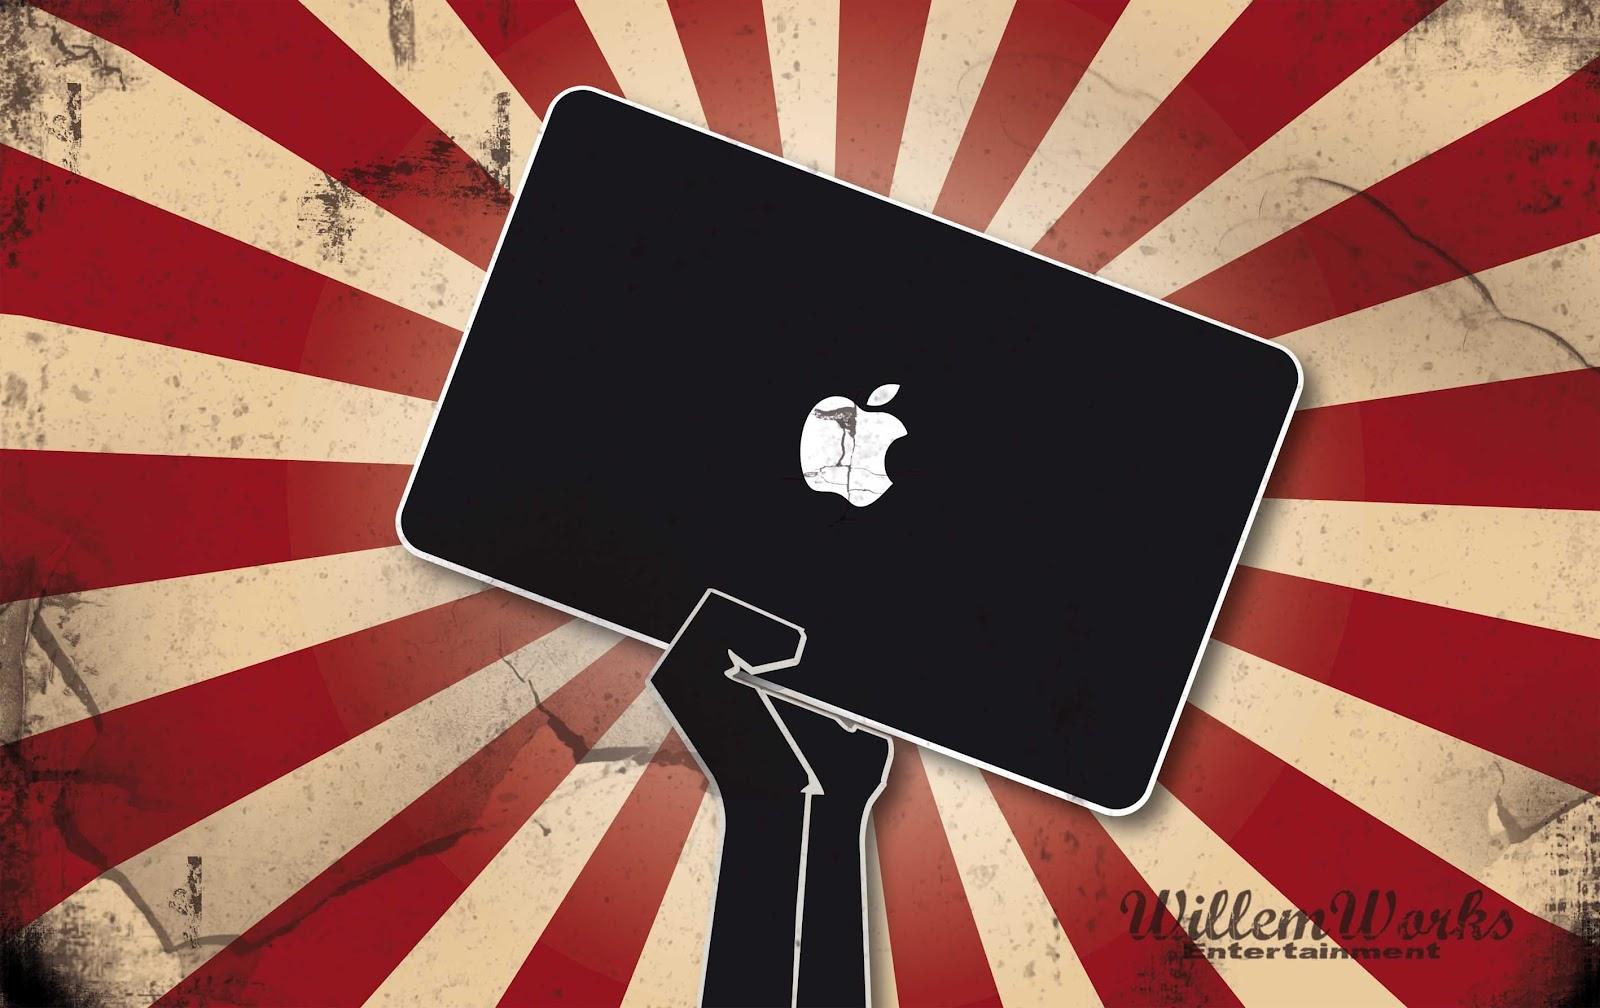 http://1.bp.blogspot.com/-4gLZtOiHYh0/T-aRq7SLztI/AAAAAAAAAM0/PkicnYpQOwU/s1600/iphone+_Apple_Mac_OS_X_The_Best_HD_wallpapers_background+016.jpg